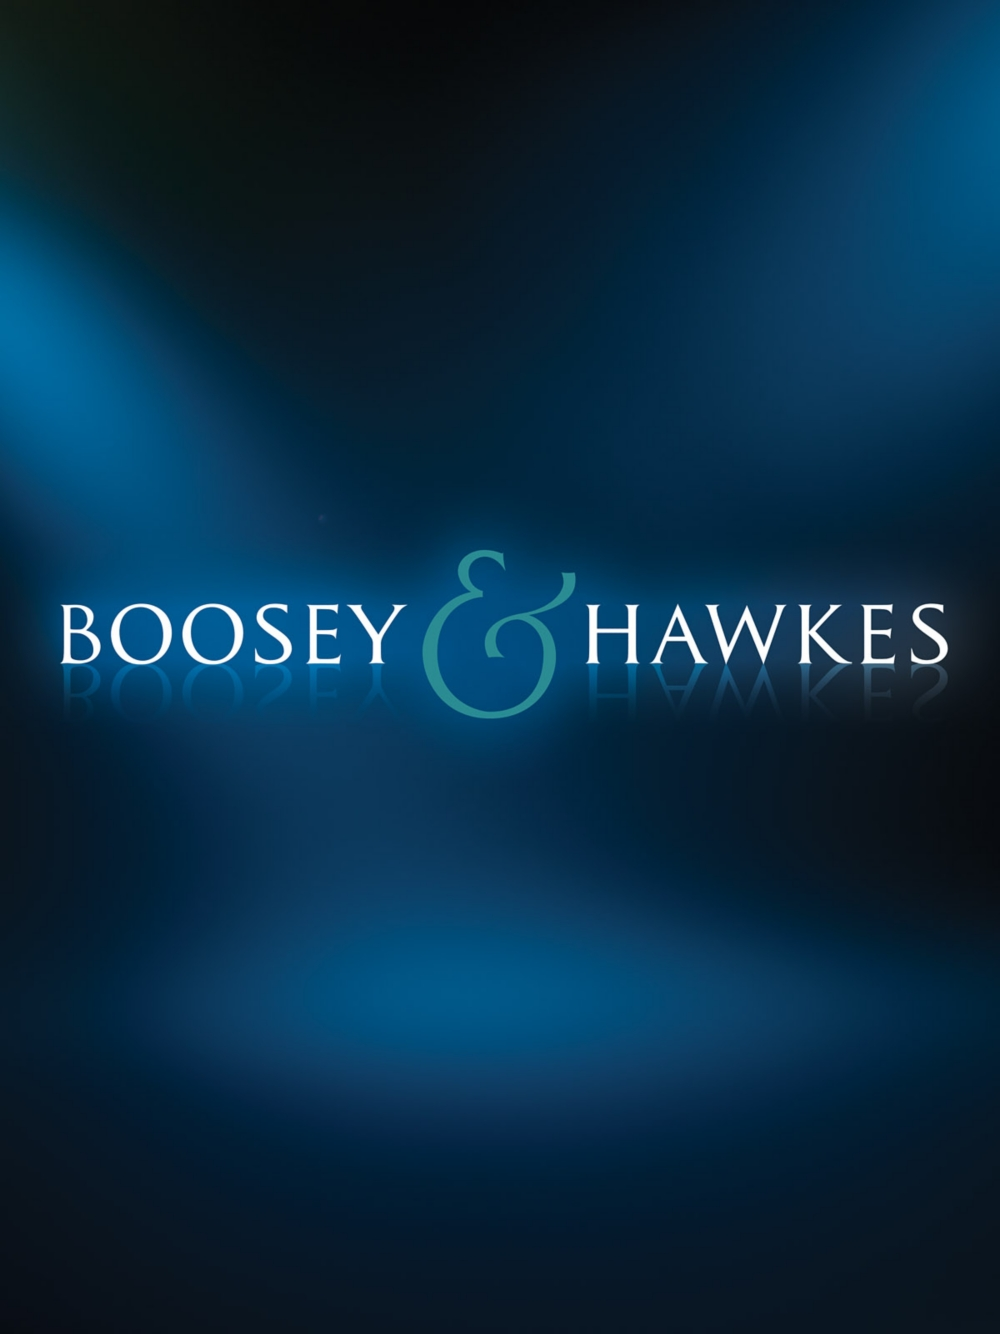 Boosey and Hawkes Fantasia (for Euphonium (Baritone) and Piano) Boosey & Hawkes Chamber... by Boosey and Hawkes